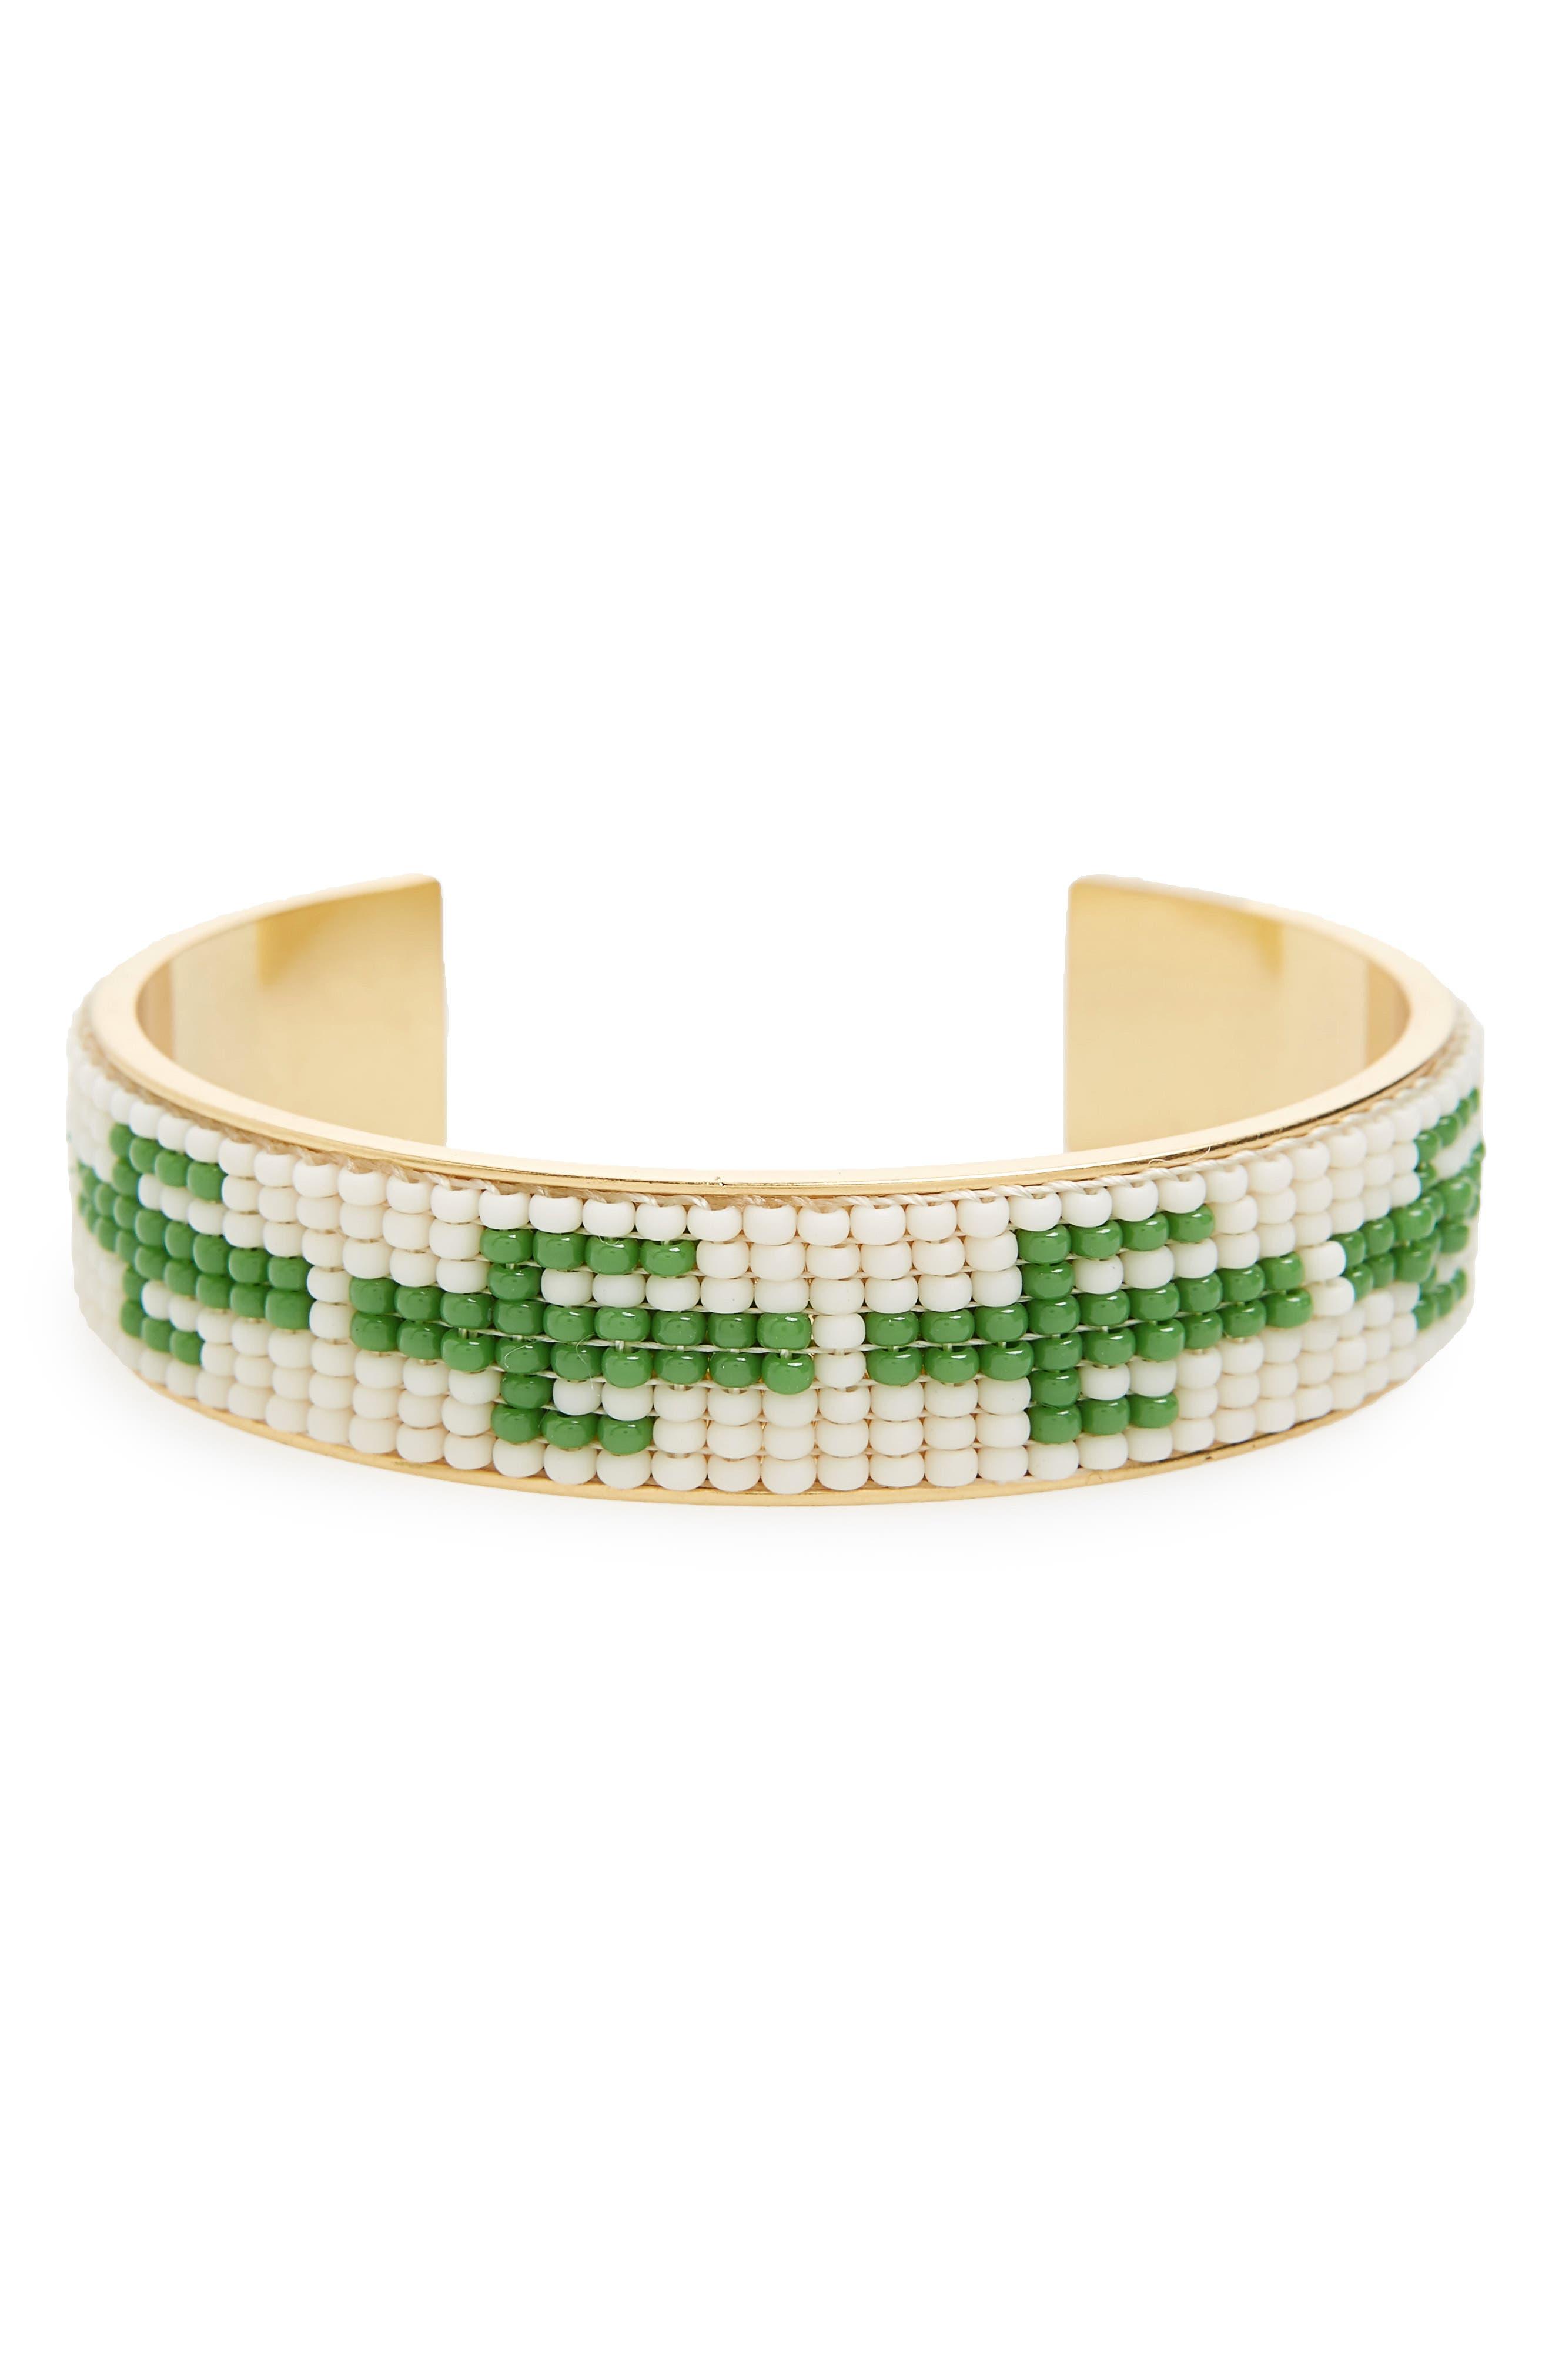 Beaded Cuff Bracelet,                             Main thumbnail 1, color,                             Cactus Green